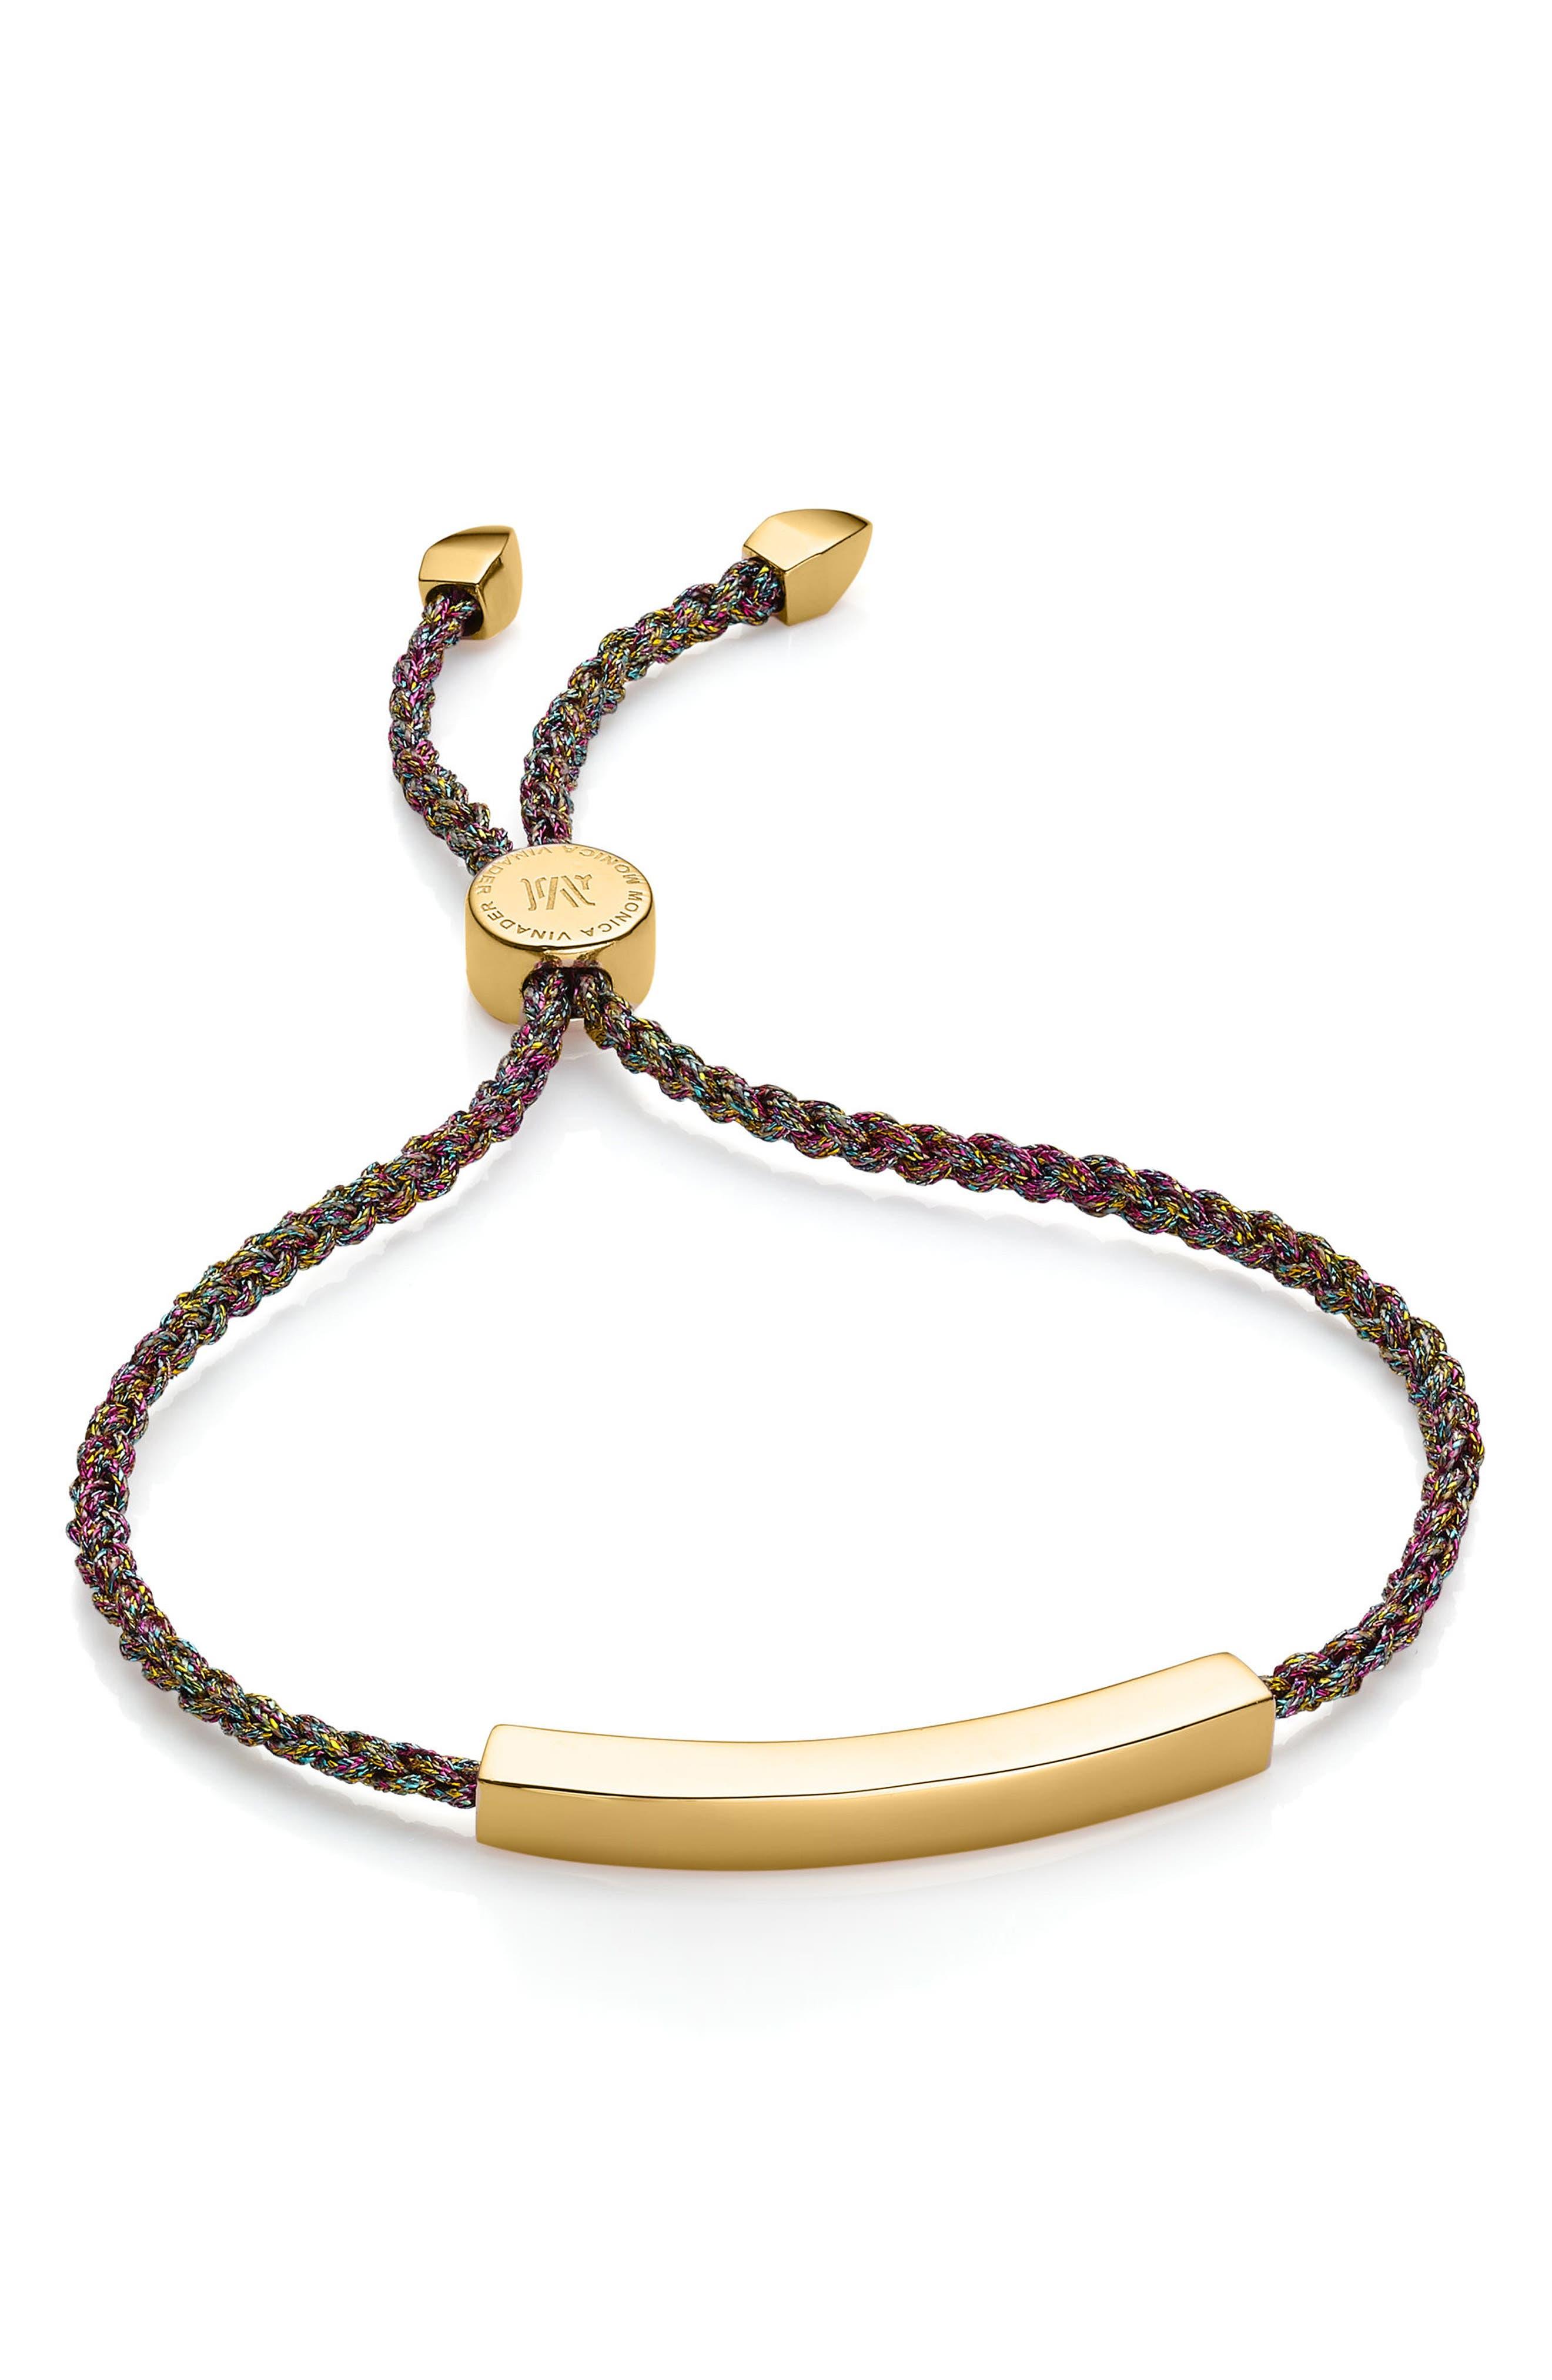 Engravable Linear Bar Friendship Bracelet,                         Main,                         color, GOLD/ RAINBOW